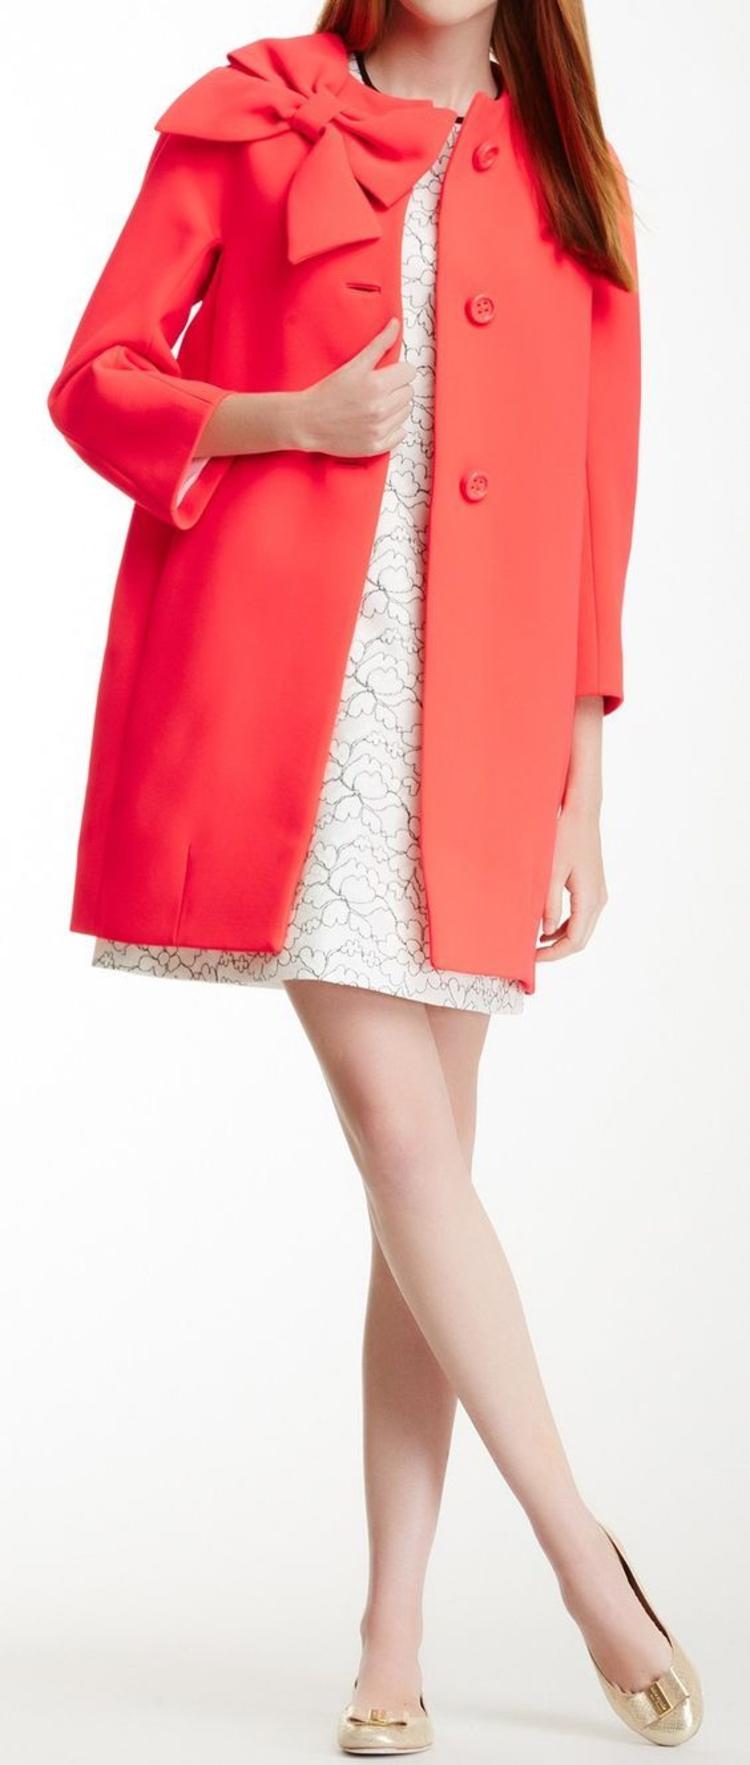 moderne Damenmäntel aktuelle Trendfarben lachsrot elegant Schleife